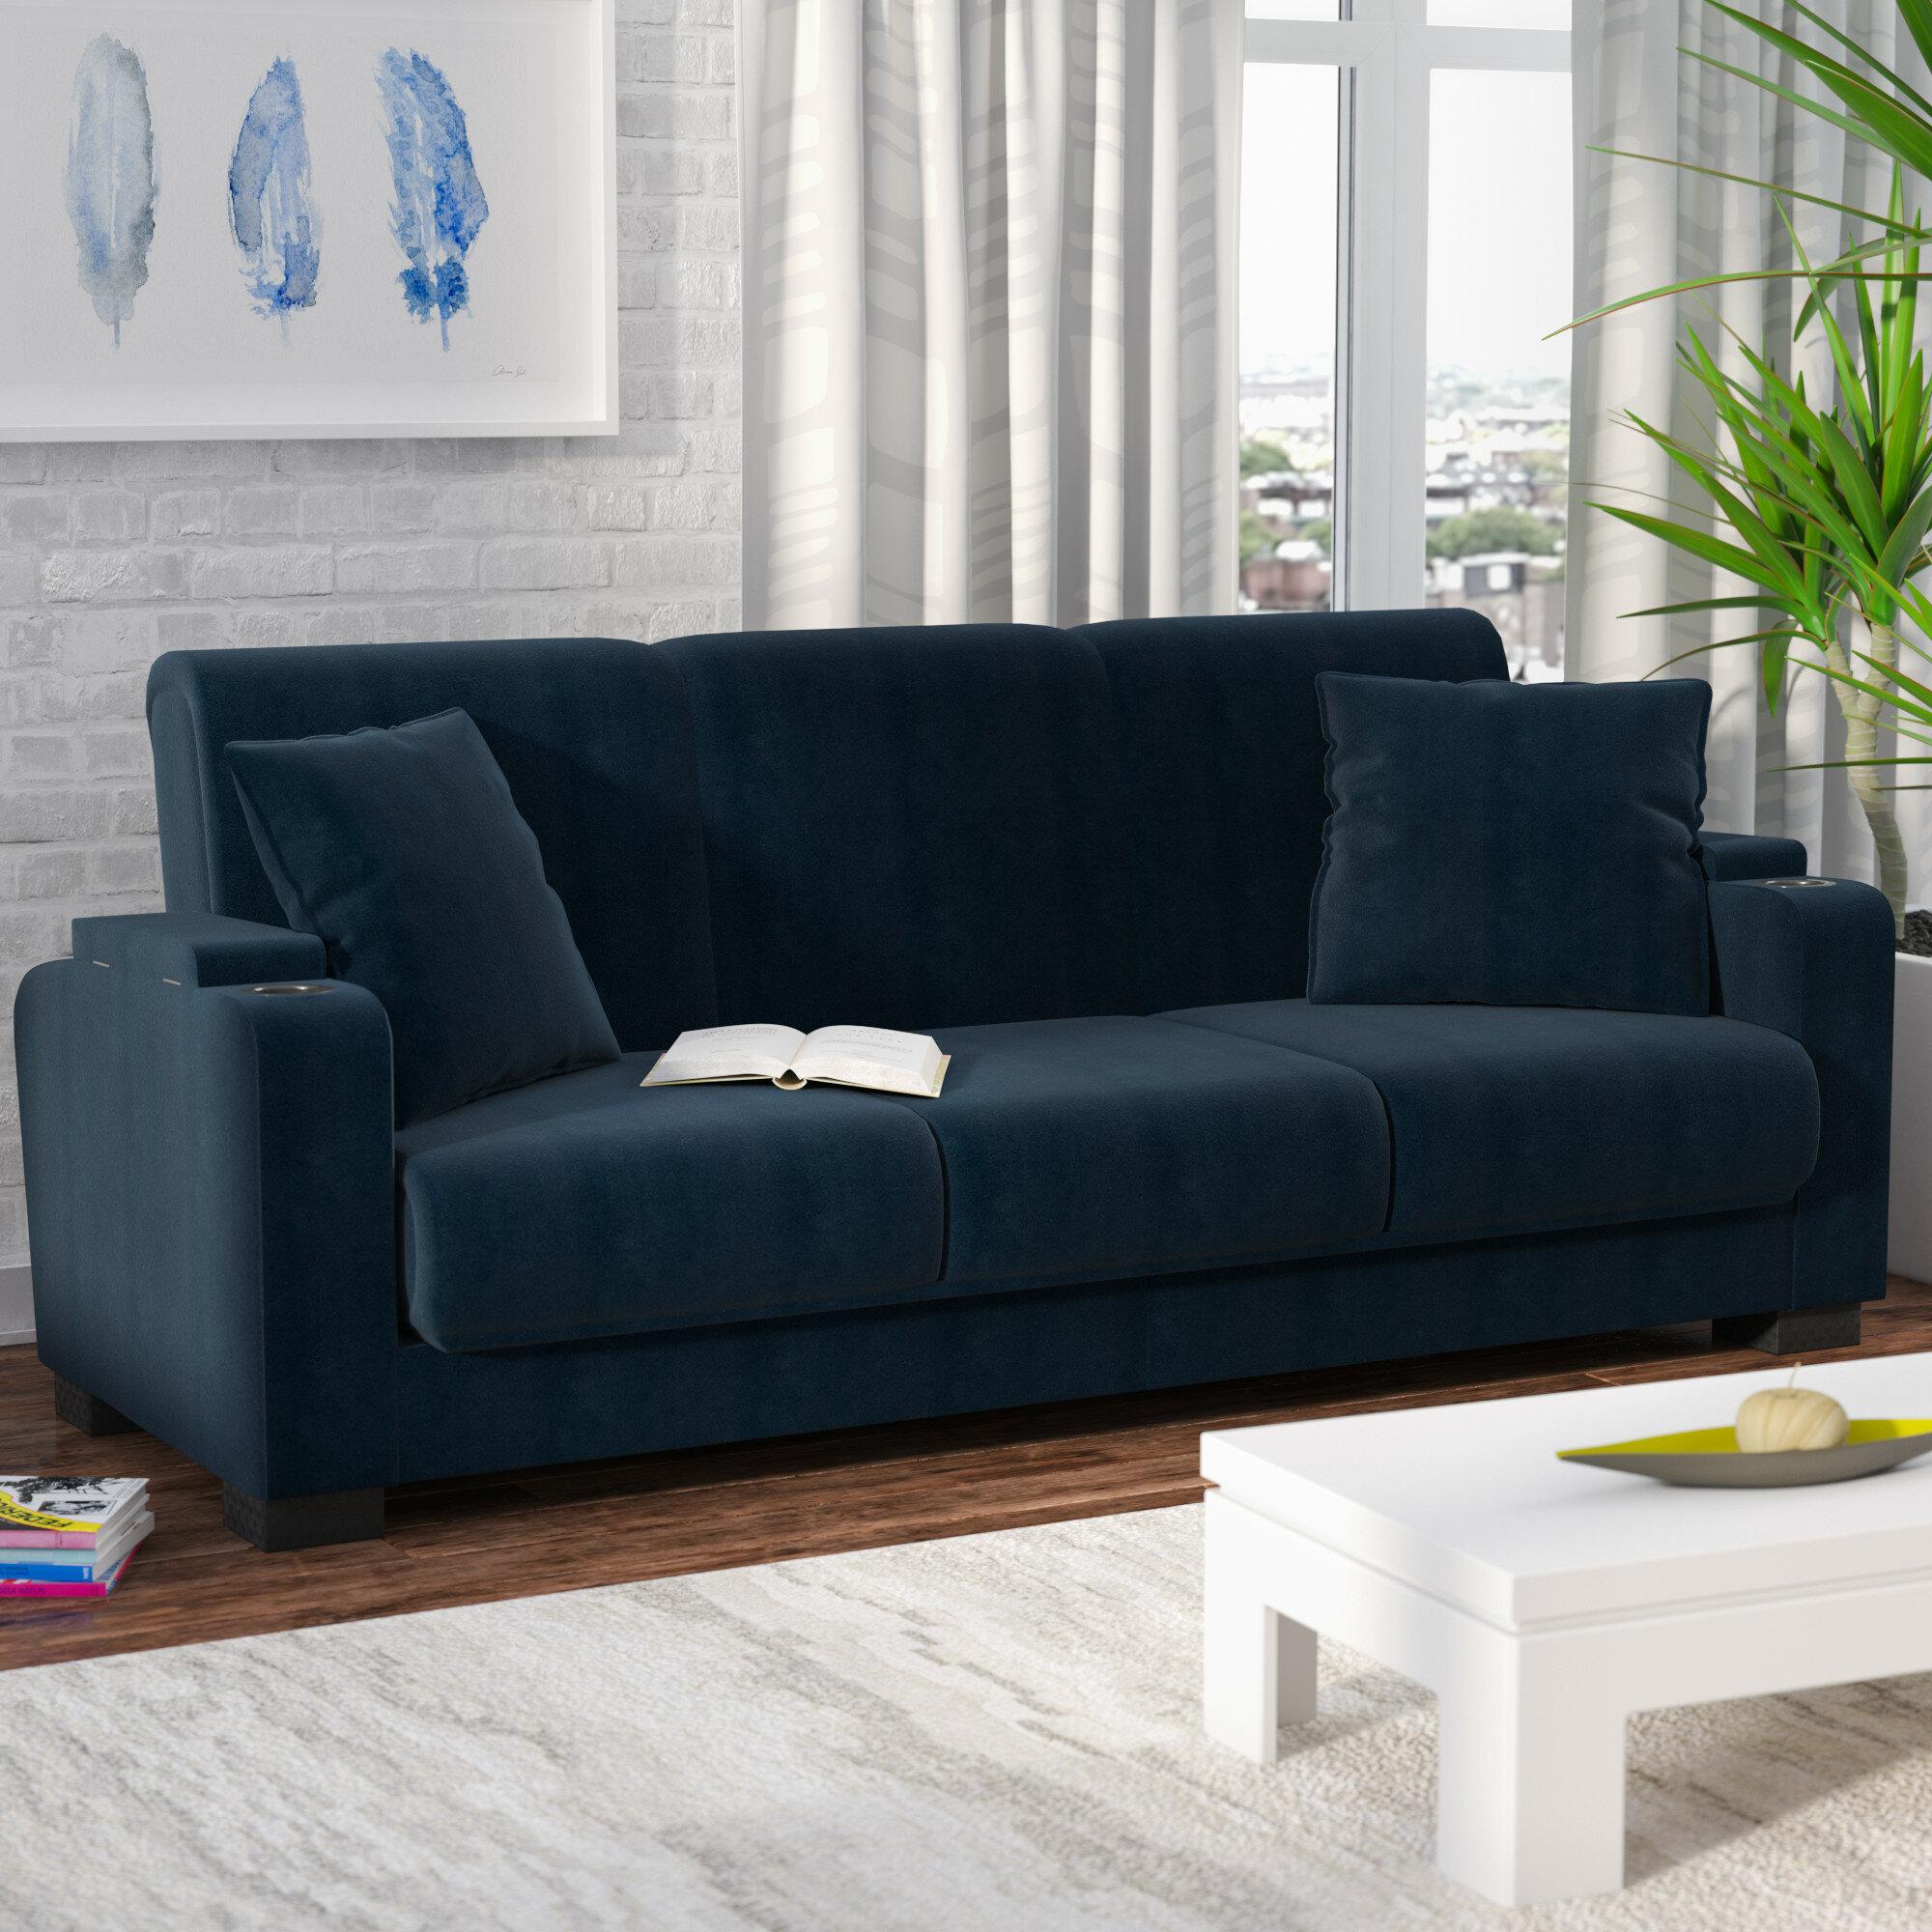 Superieur Trent Austin Design Ciera Convertible Sleeper Sofa U0026 Reviews | Wayfair